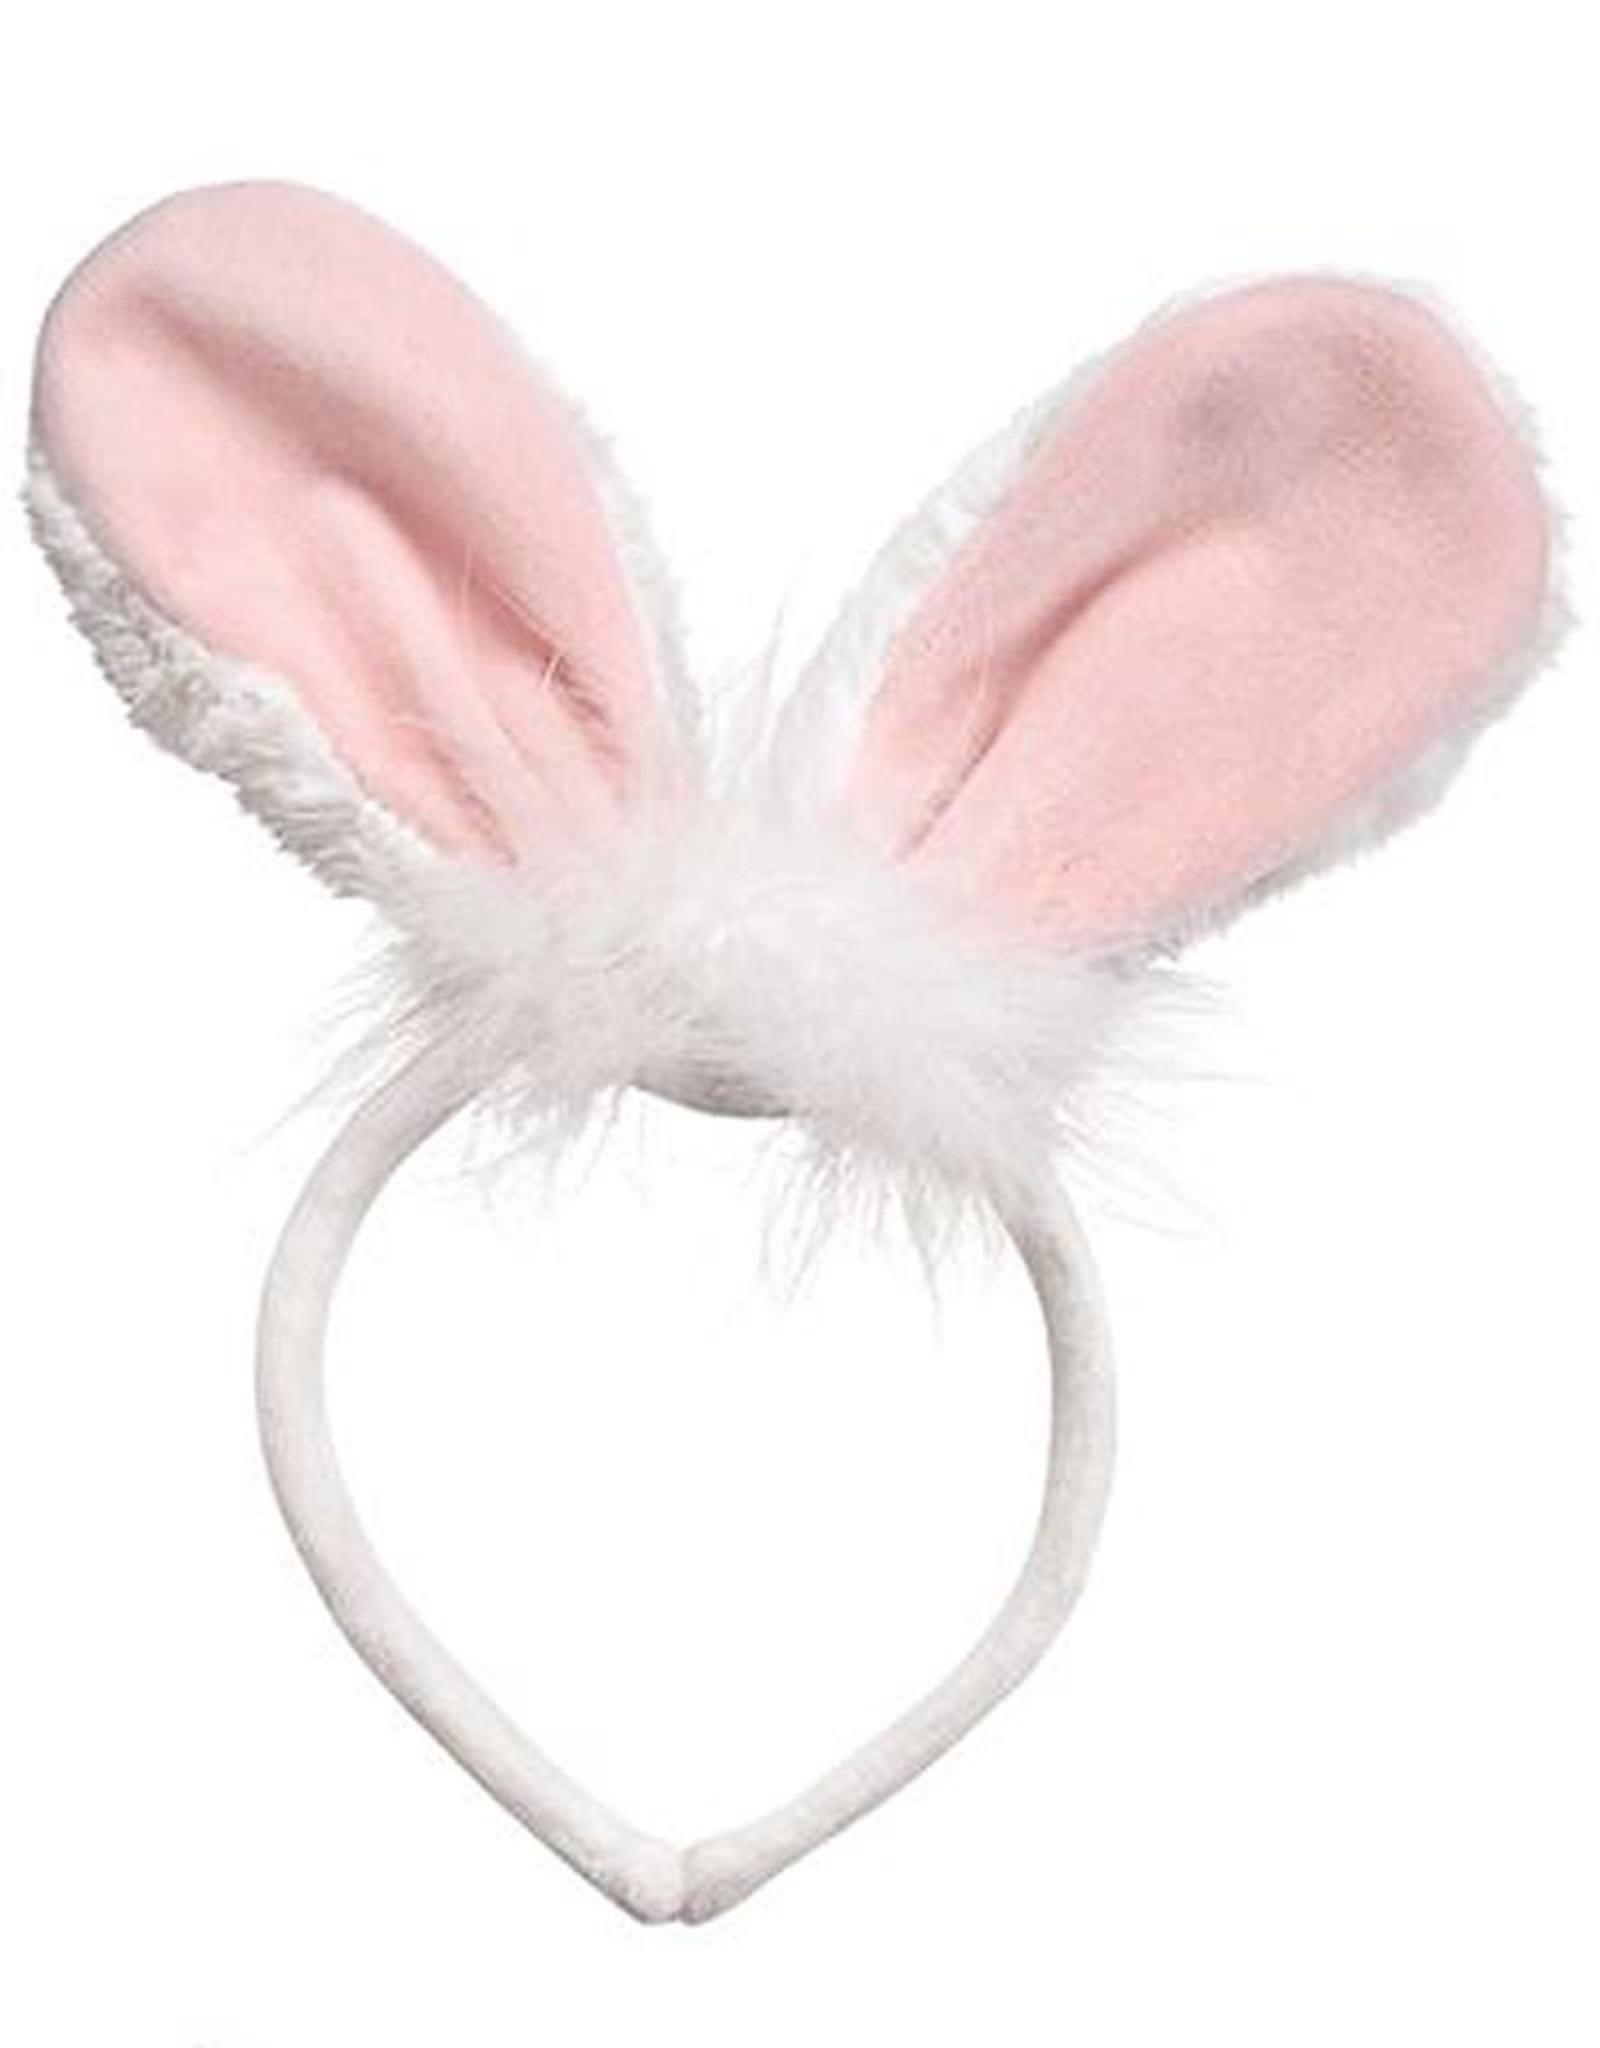 Mud Pie Bunny Ears Headband - White w Pink Velour